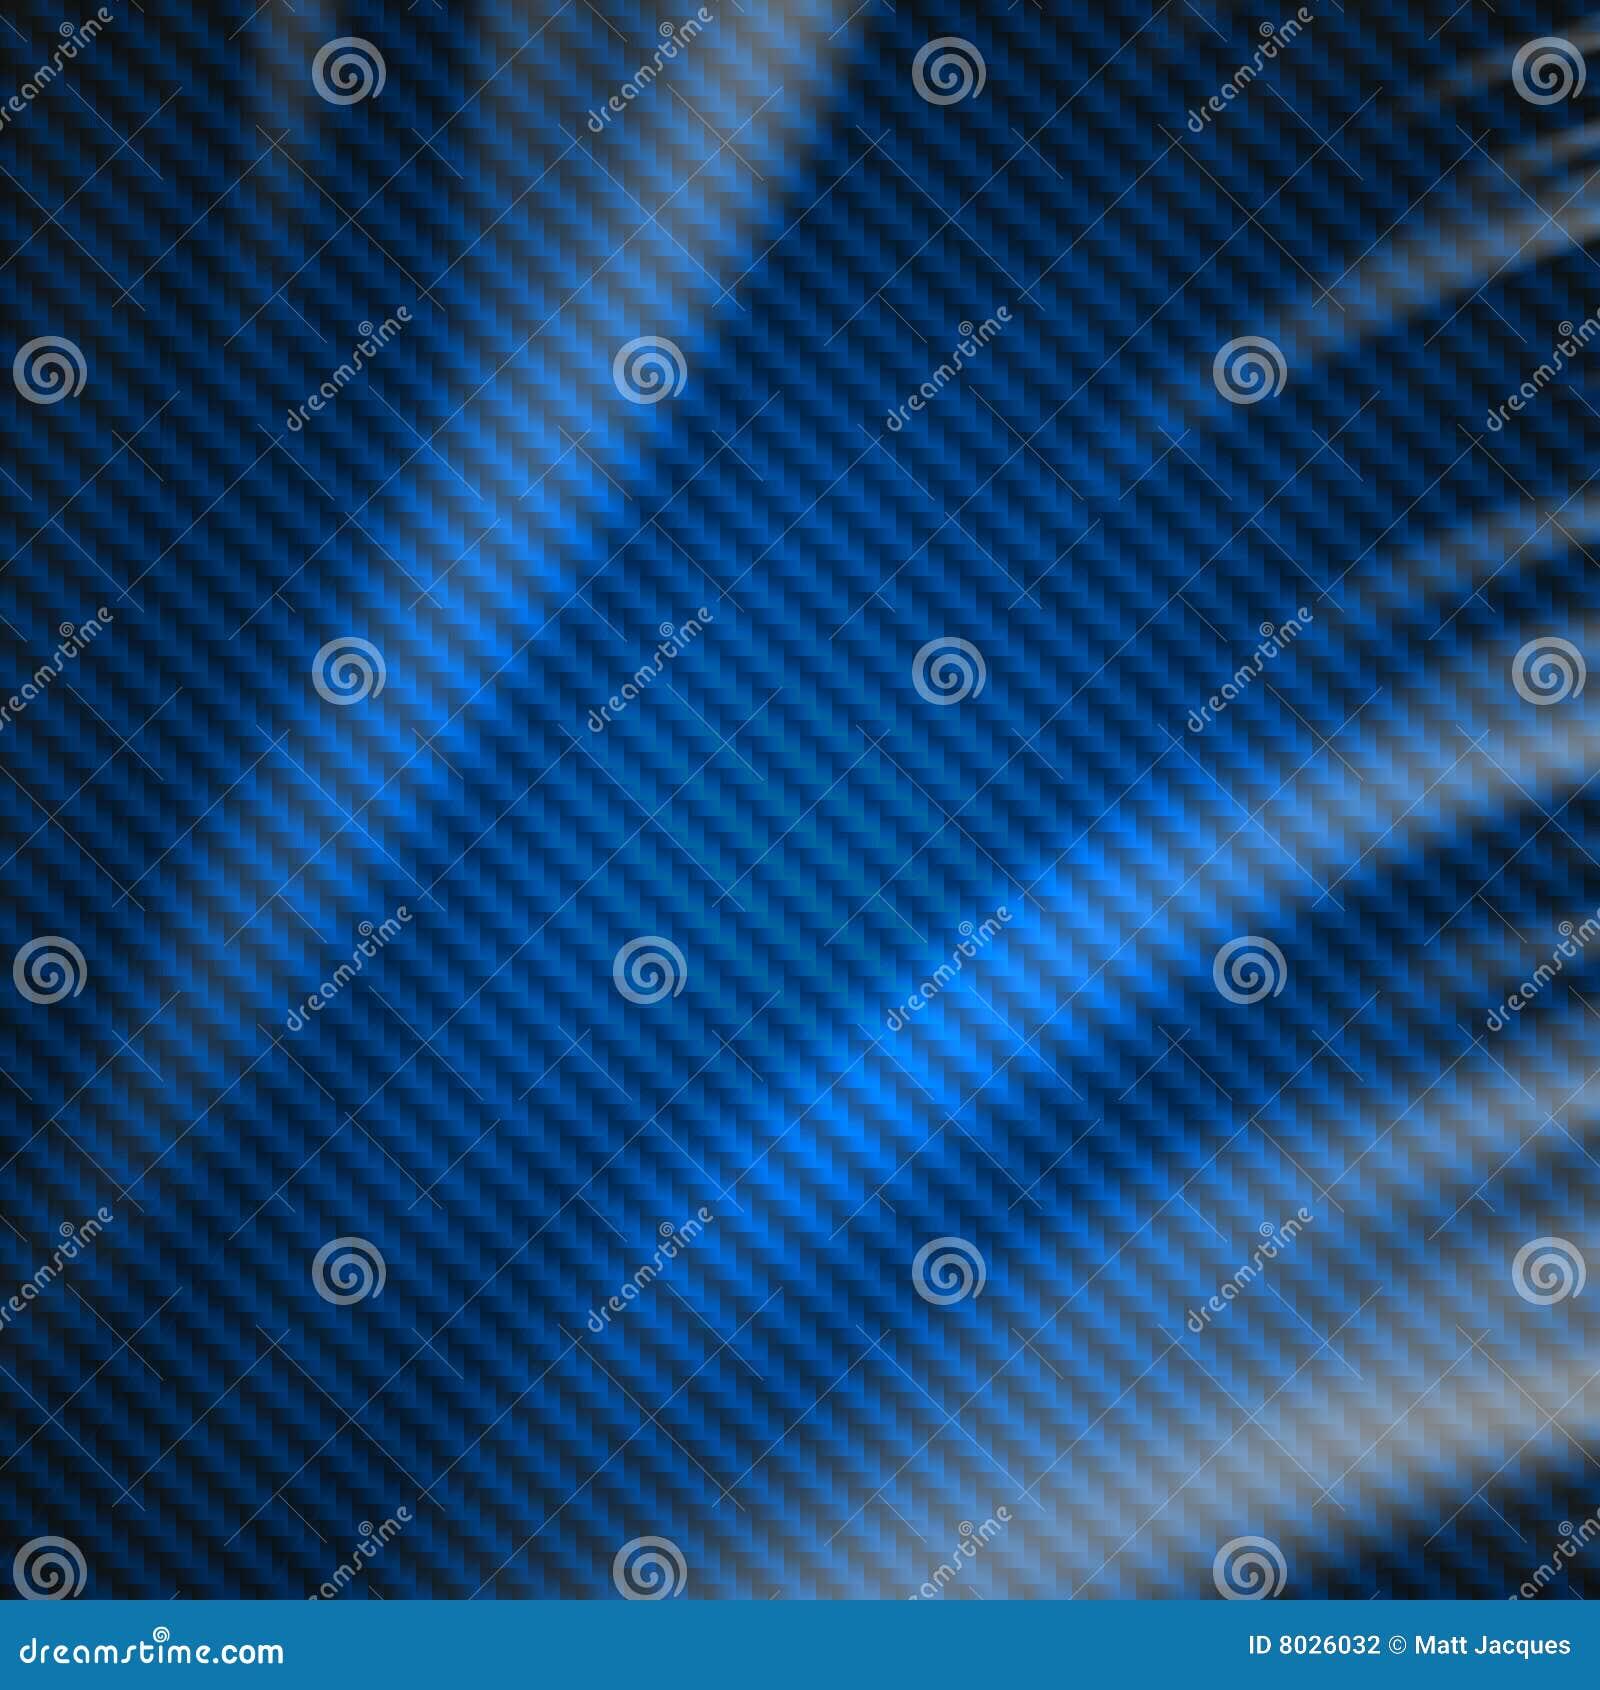 abstract blue carbon fiber background stock illustration